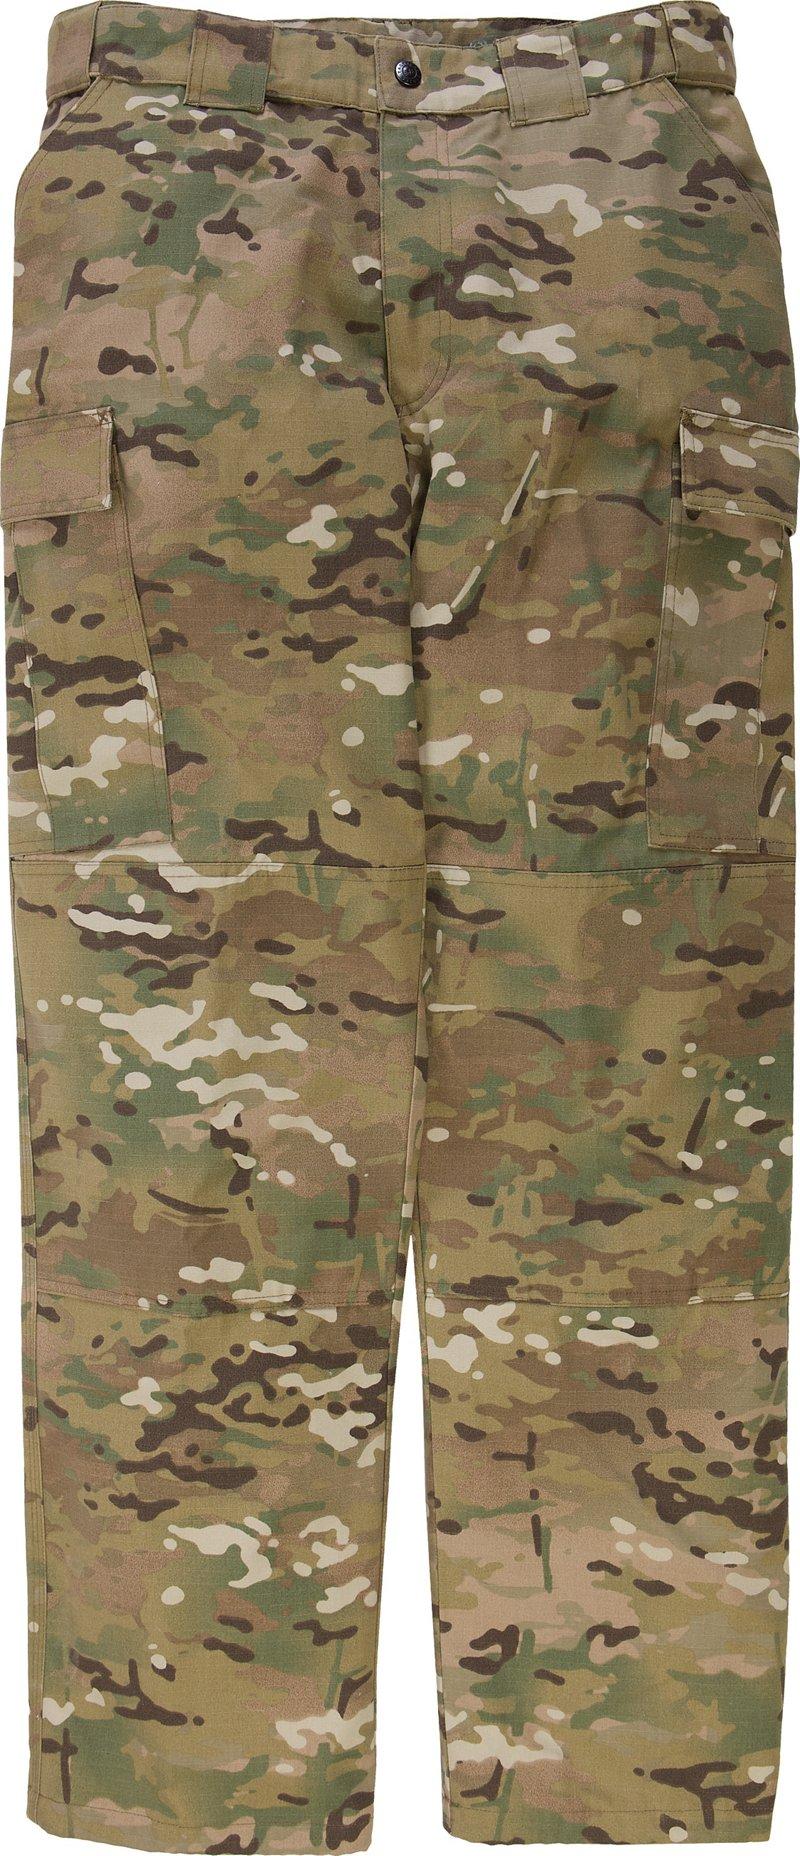 5.11 Tactical Men's MultiCam TDU Pant (Multi Camo, Size Medium) - Men's Outdoor Apparel, Men's Outdoor Pants at Academy Sports thumbnail